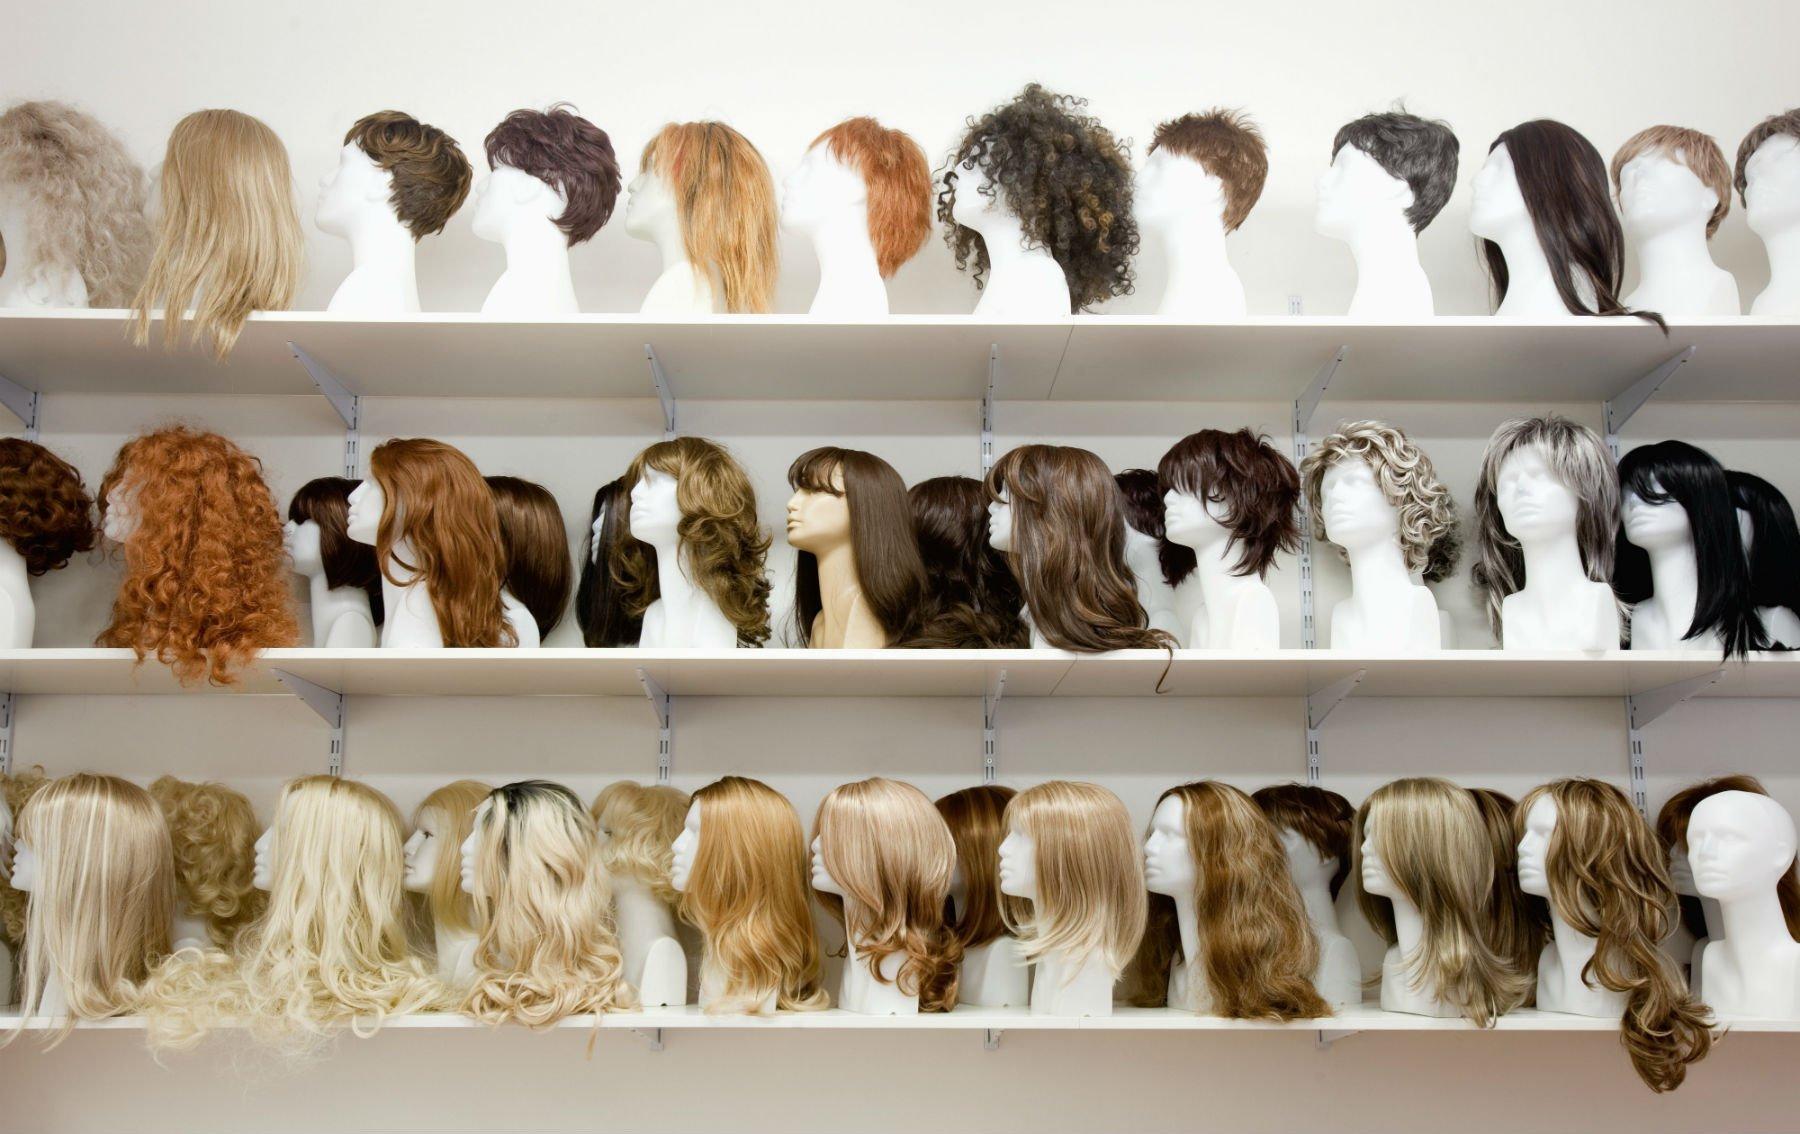 parrucche in esposizione